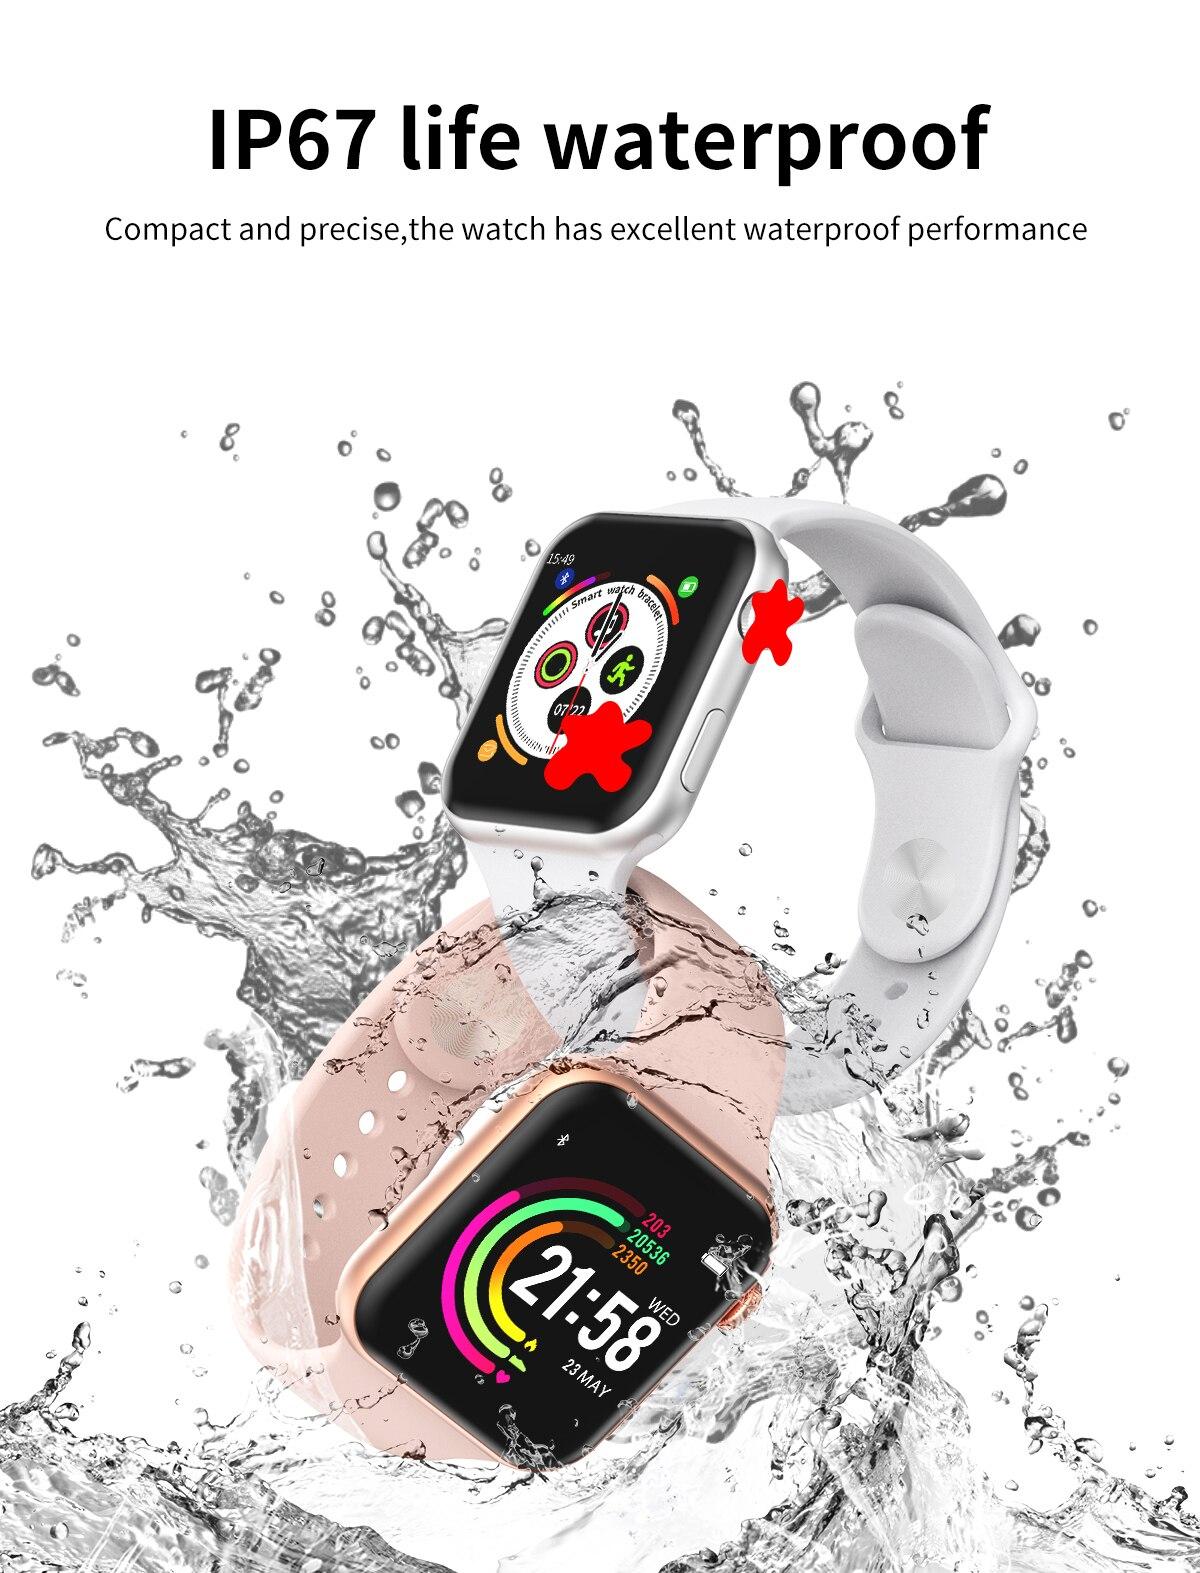 Hbcf764040bab479e9543ed097ace3931k 696 New Style F10 Smart Watch Full touch screen Bluetooth Smartwatch Music Camera Heart Rate Monitor Waterproof Smart Bracelet